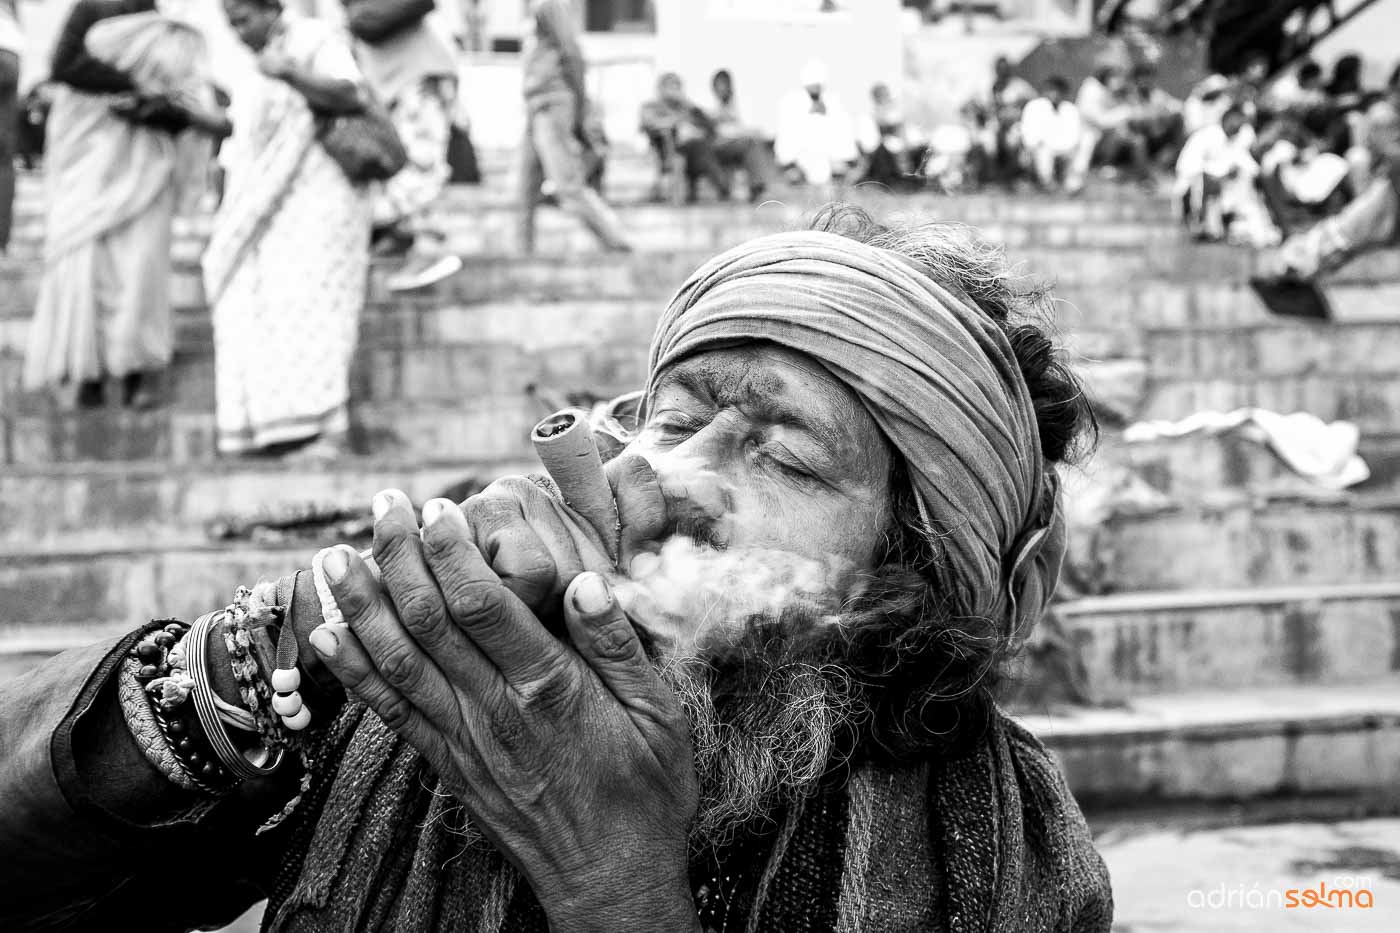 Fumadores de Marihuana a las orillas del Ganges. Varanassi